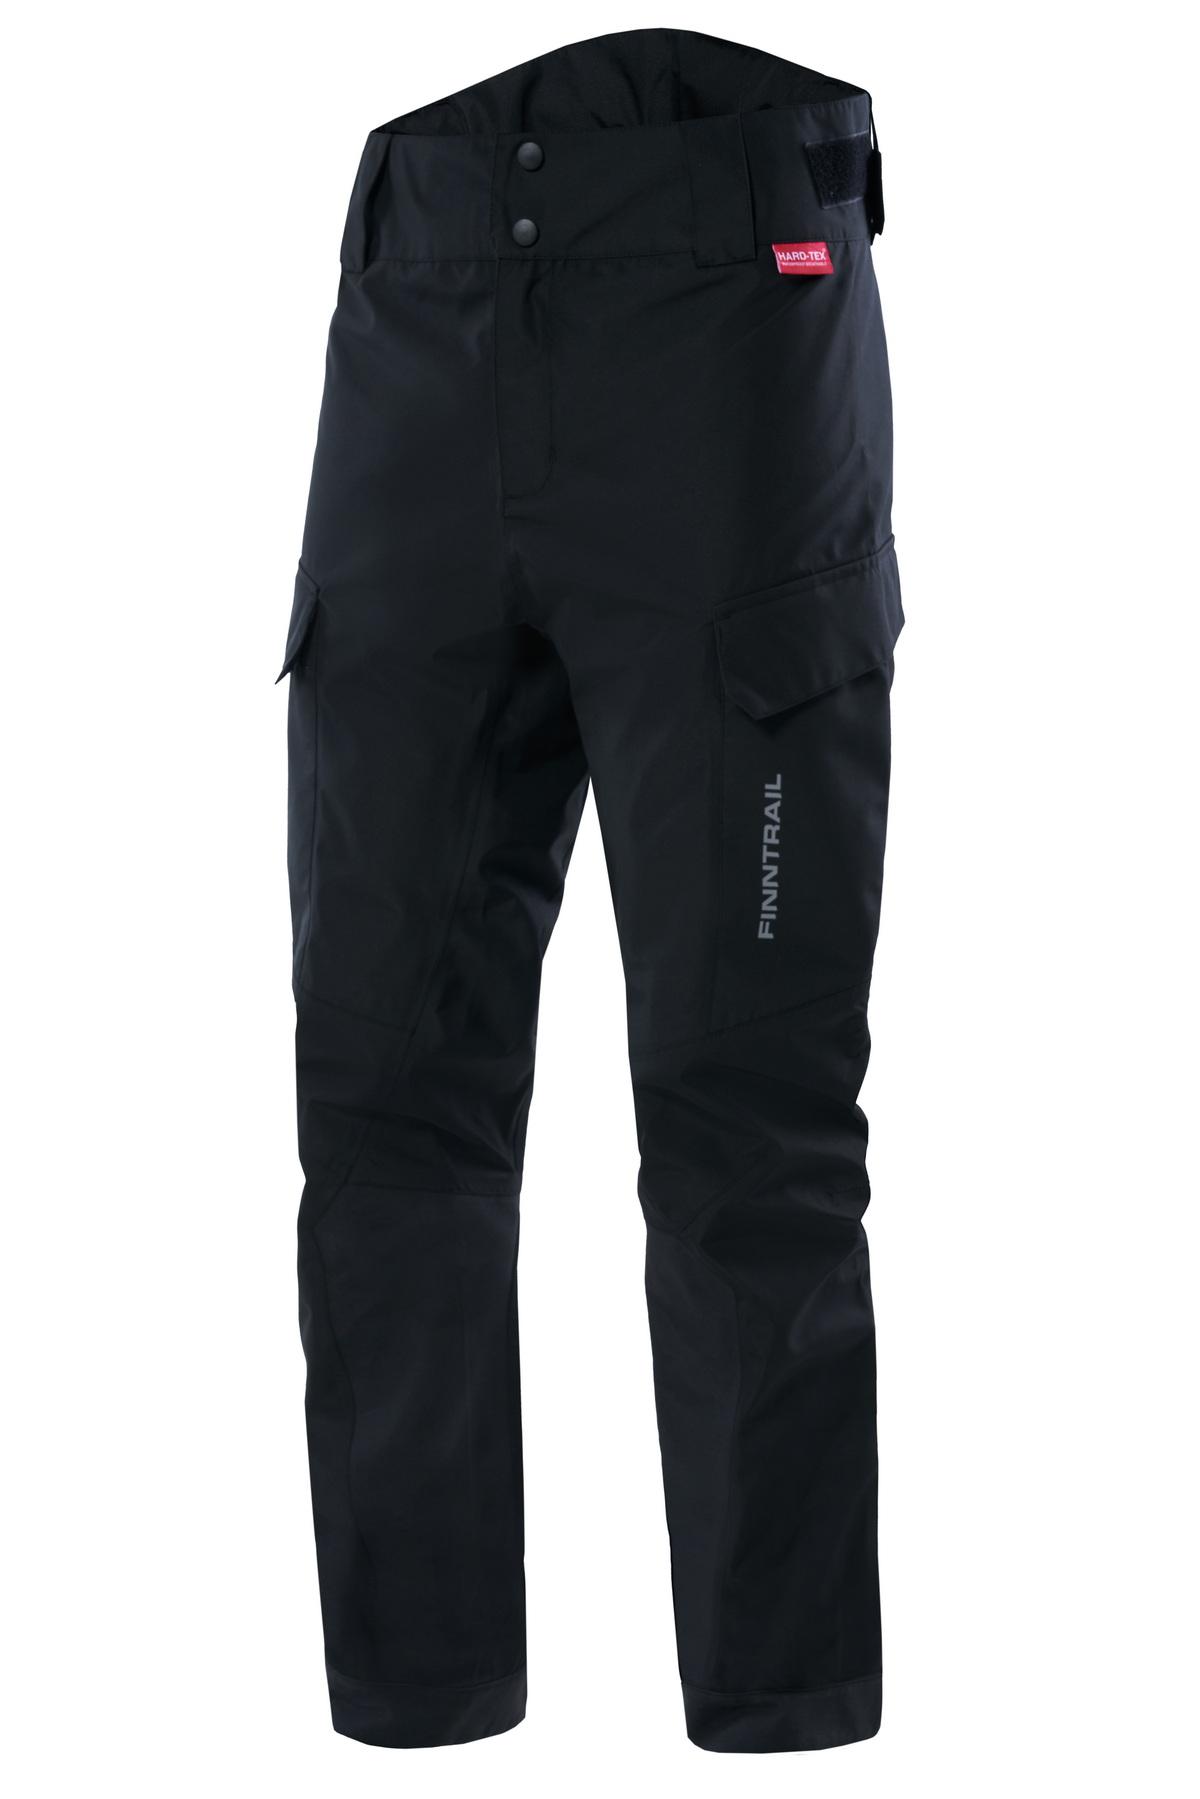 Finntrail Pants Expert Graphite